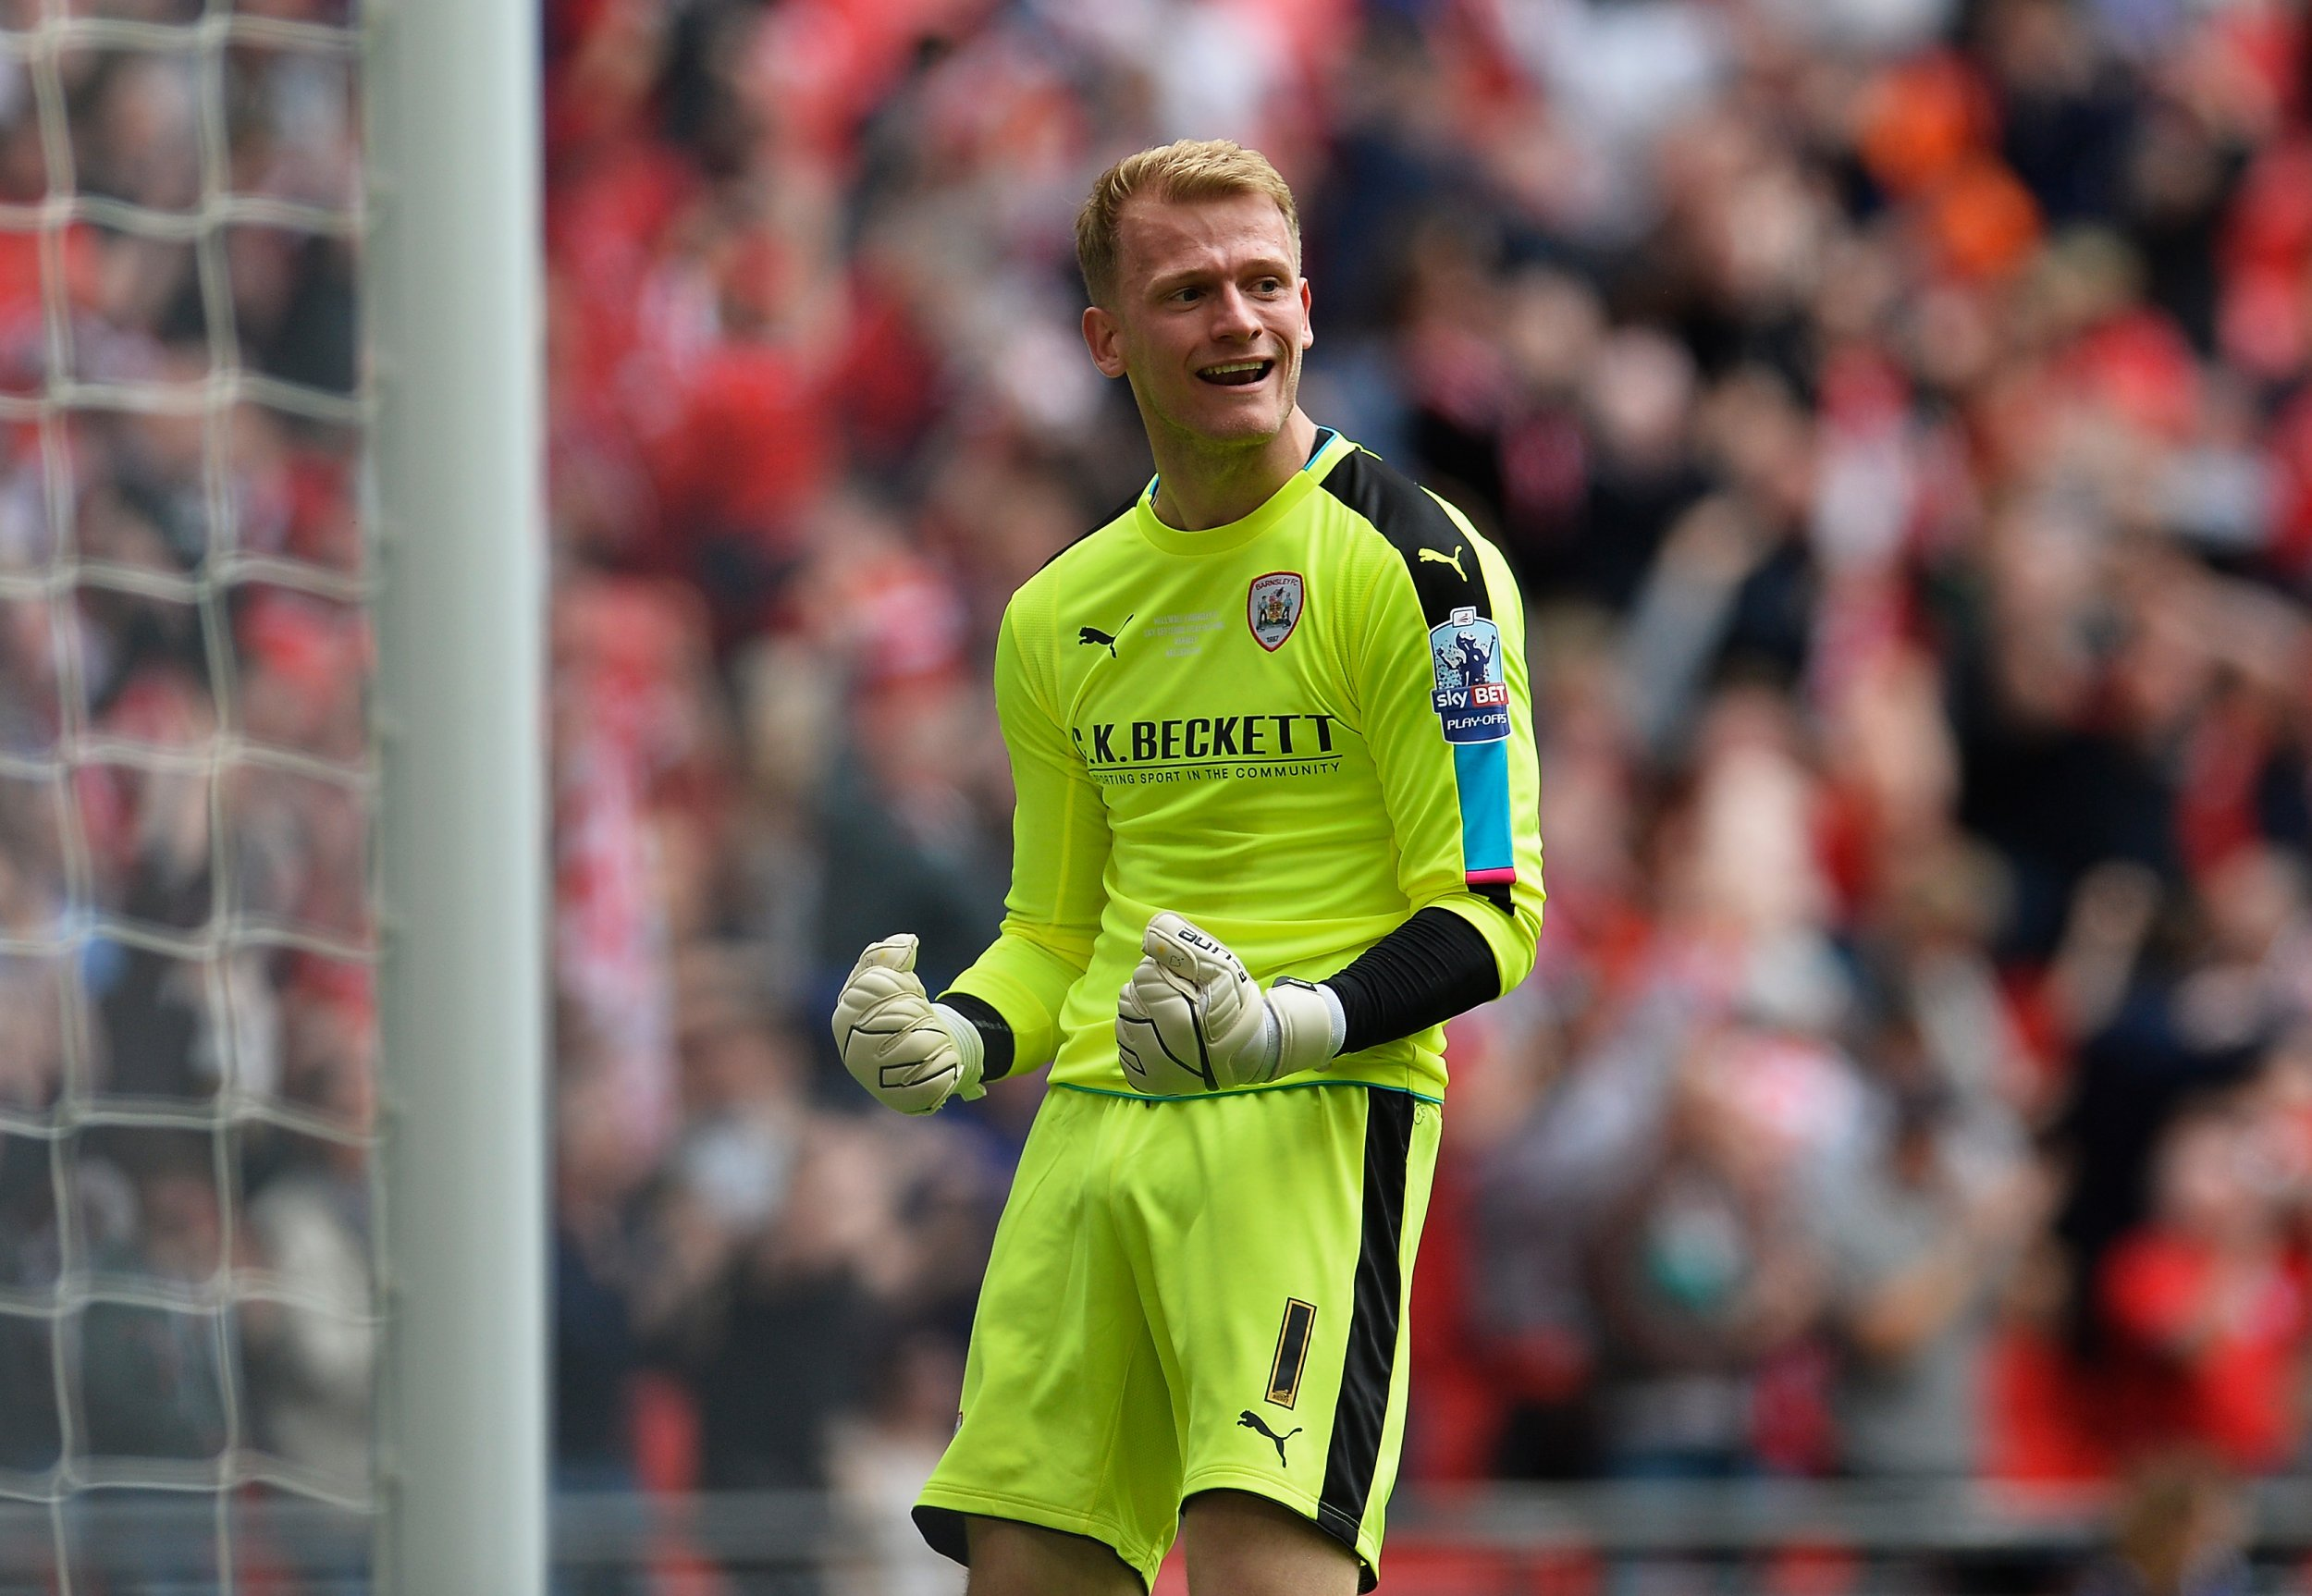 Adam Davies of Barnsley F.C. at Wembley Stadium, London, England, May 29 2016.